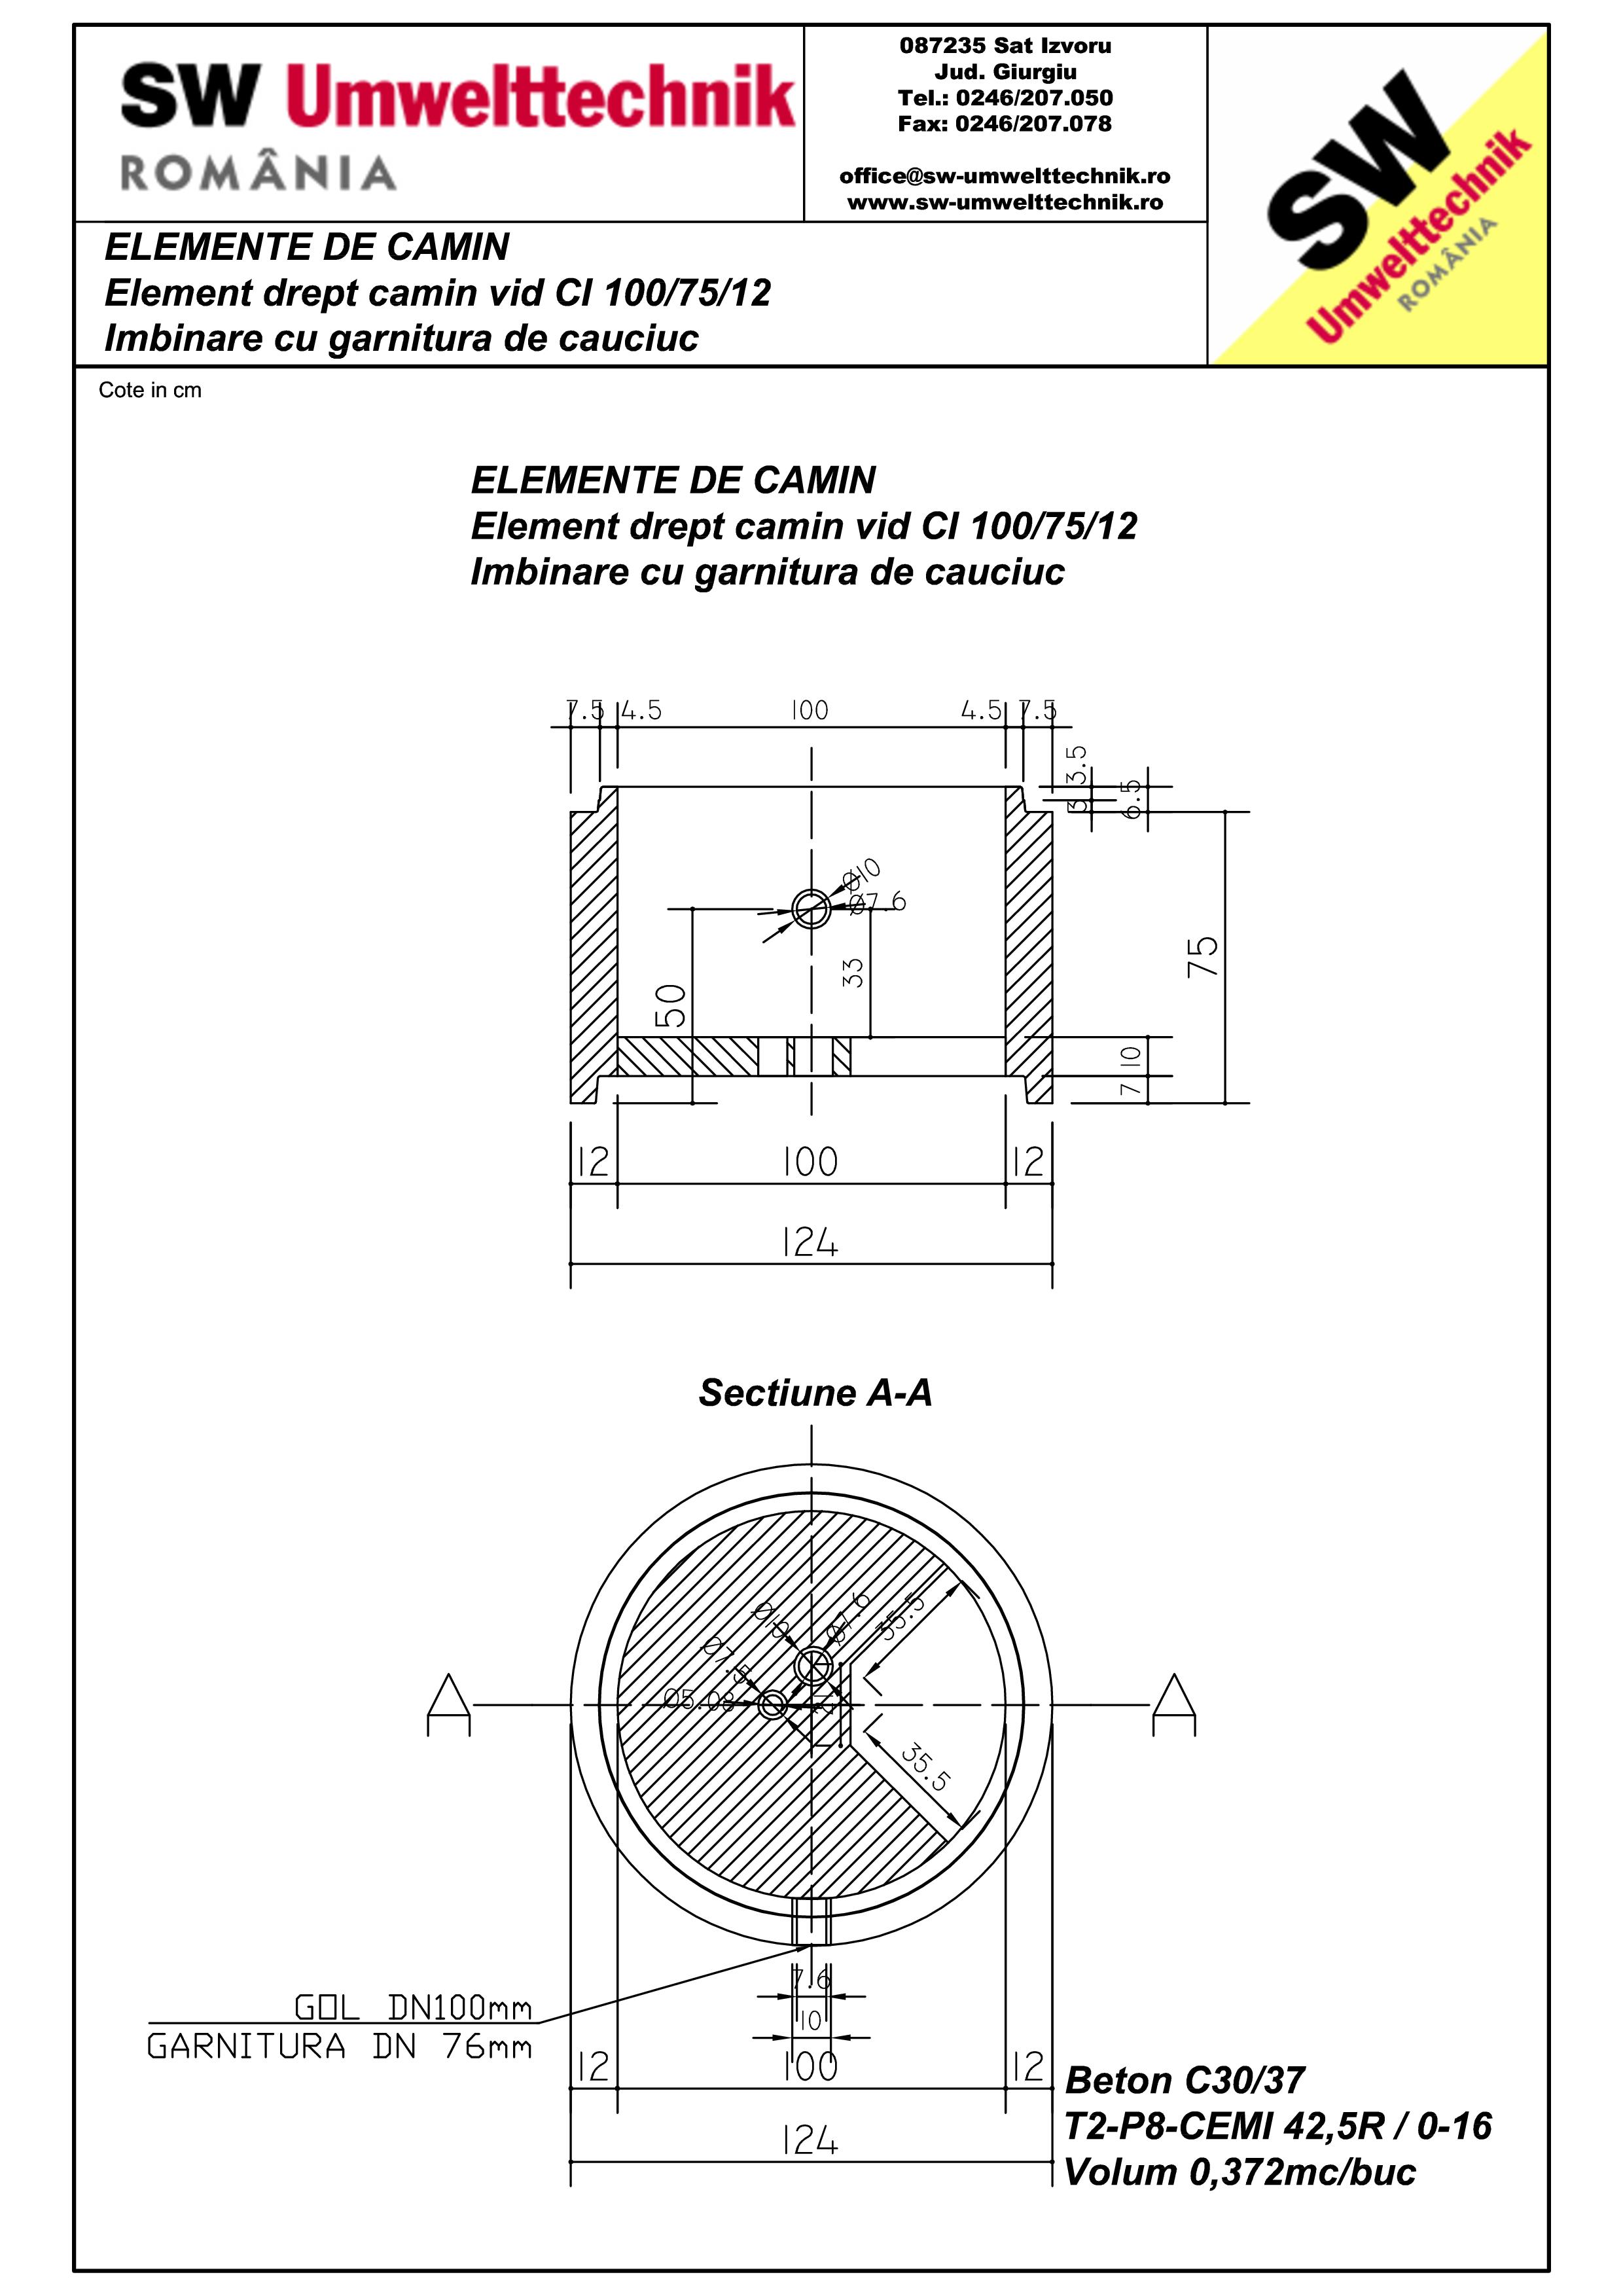 Pagina 1 - CAD-PDF Element drept - inel camin vid DN1000 H75cm SW UMWELTTECHNIK Detaliu de produs